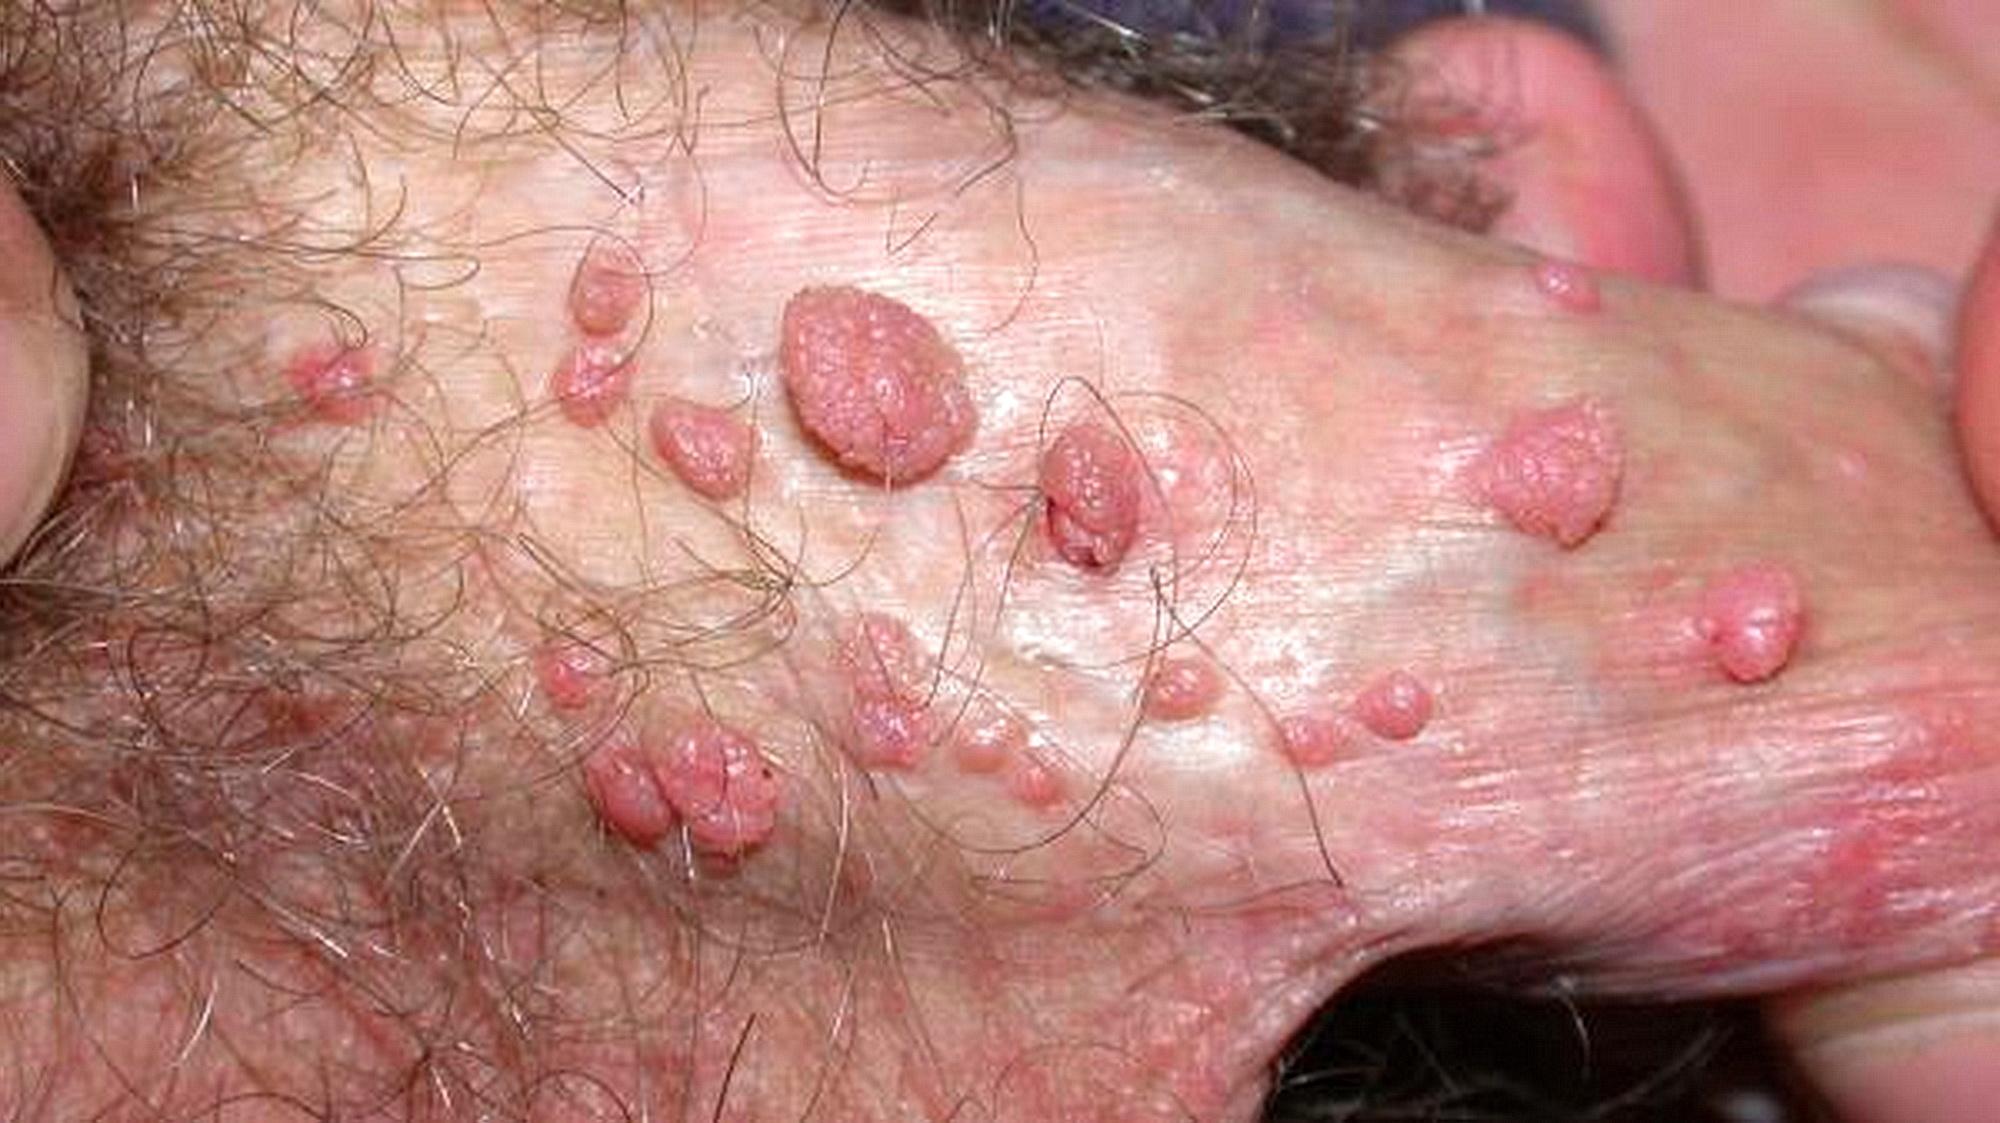 papilloma grandi labbra cancer la cap de pancreas